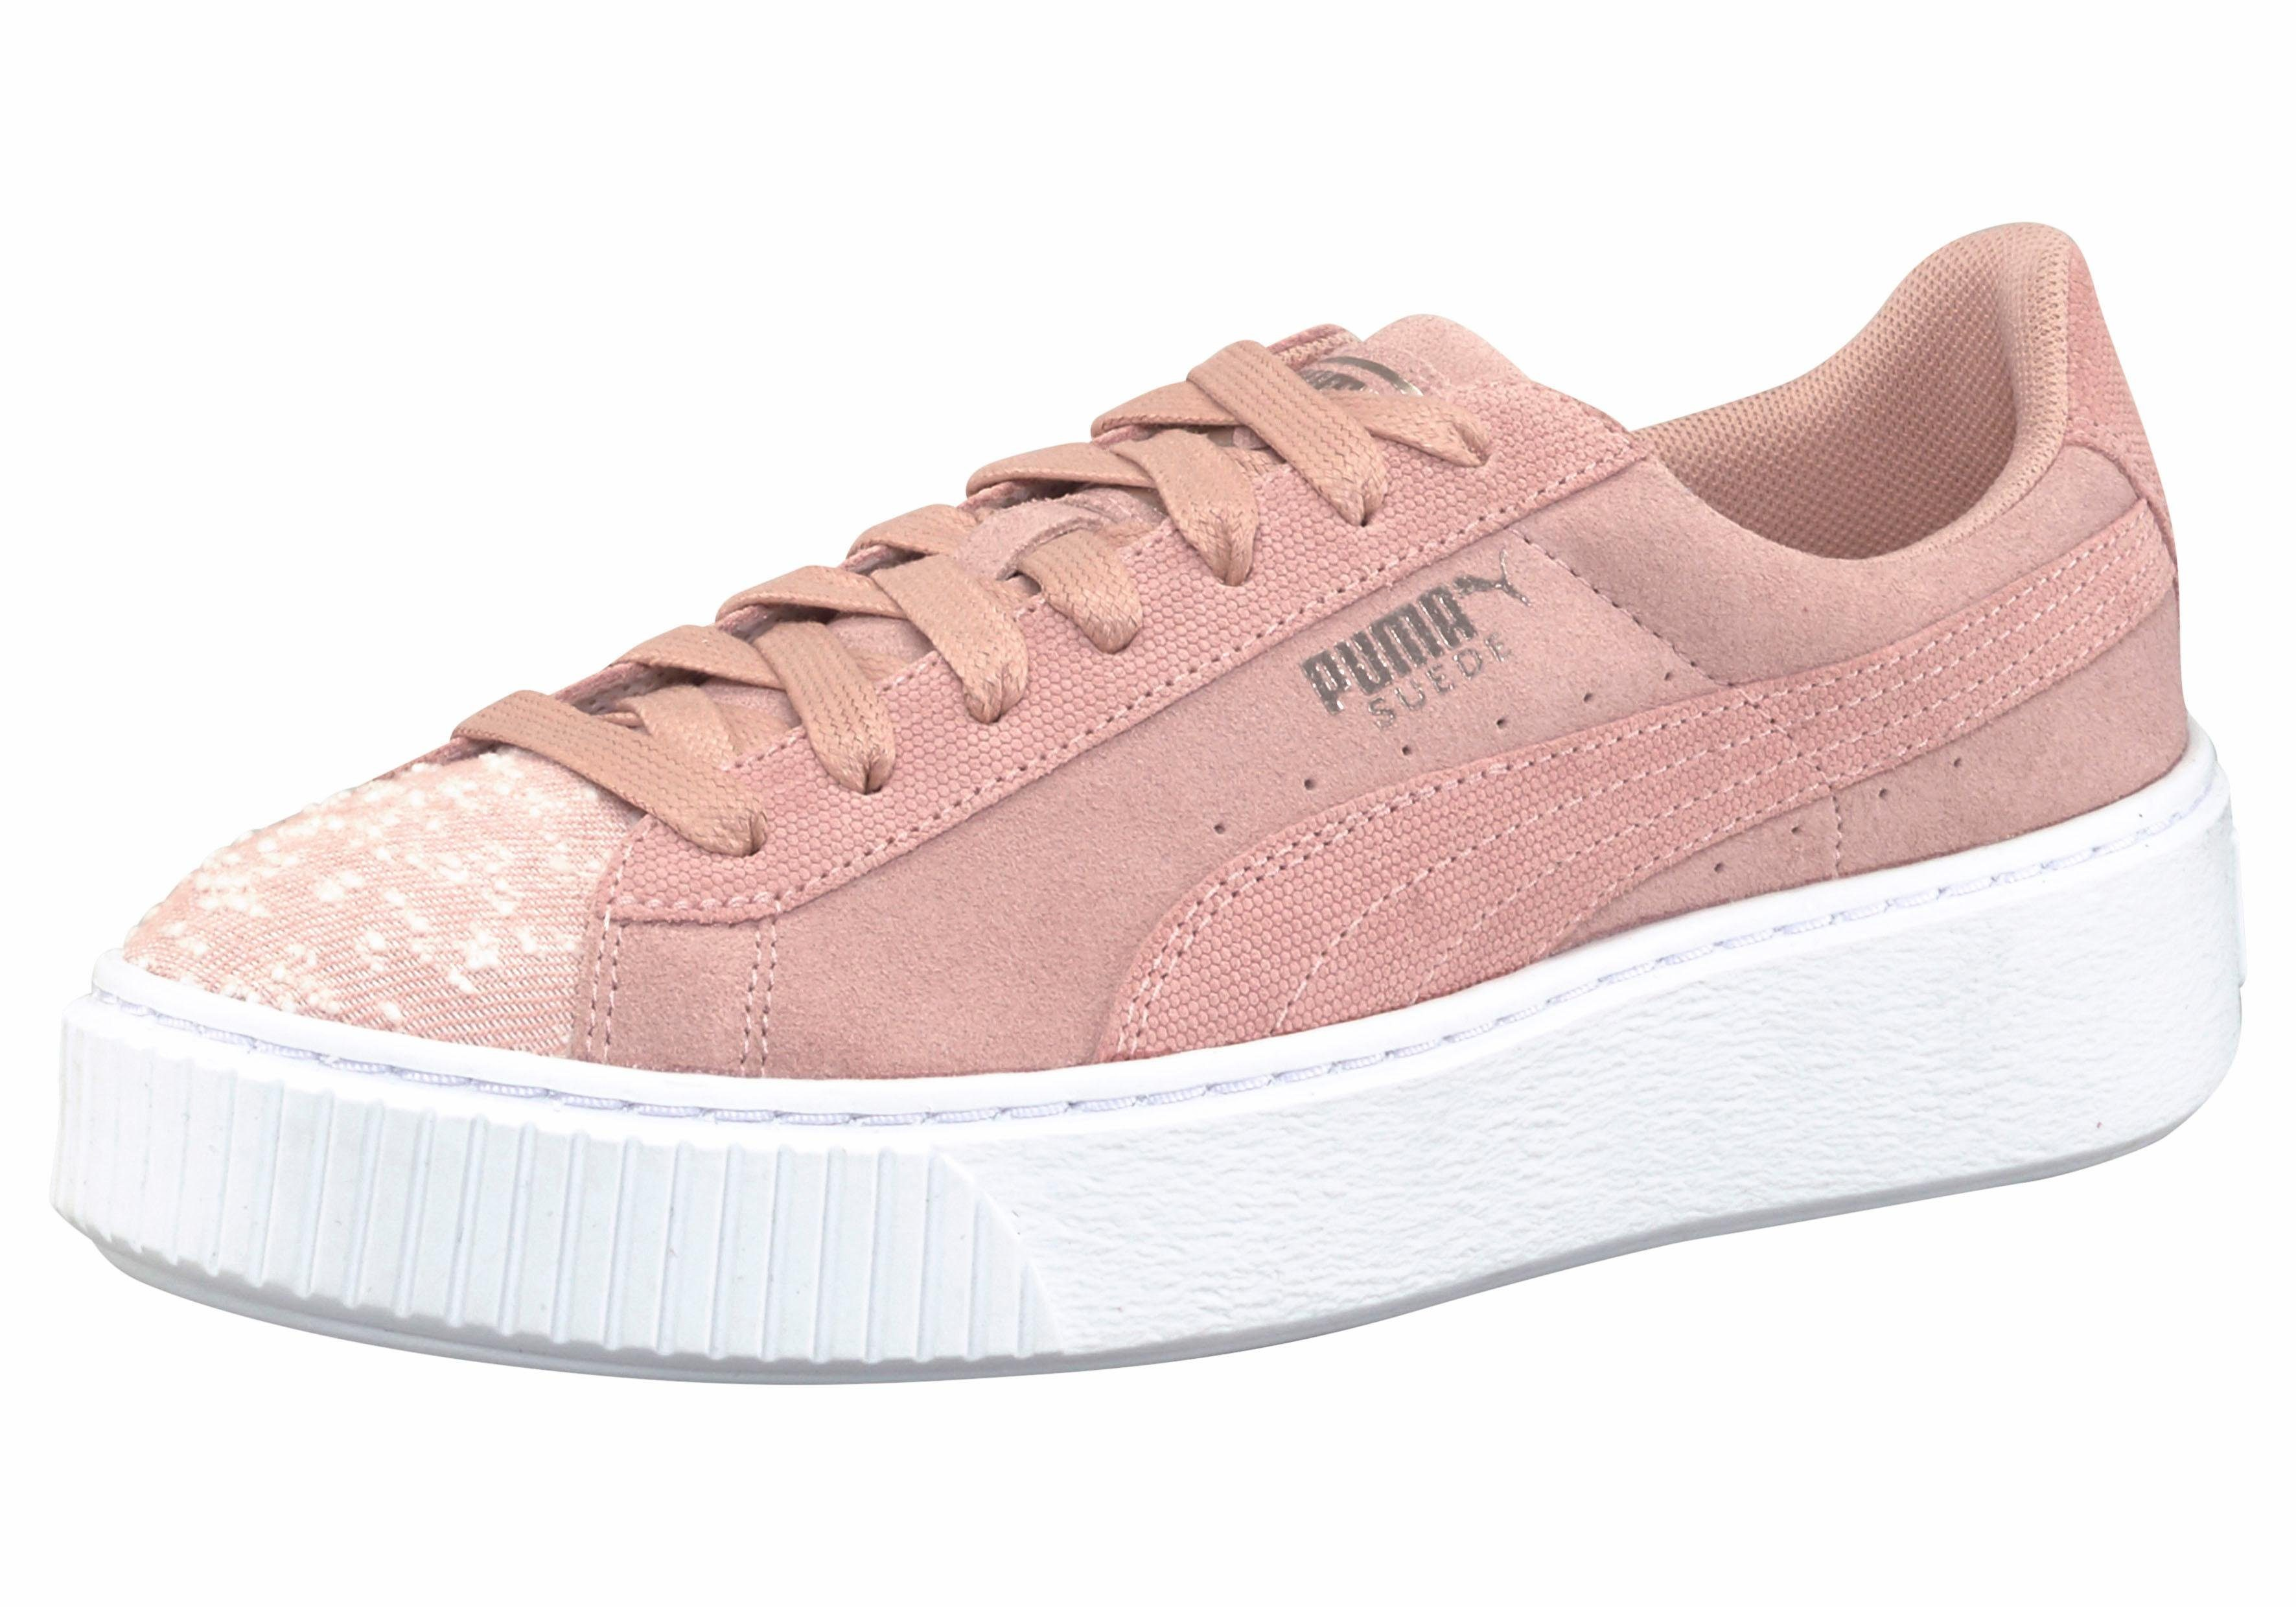 PUMA Suede Platform Pebble Womens Sneaker kaufen  rosé